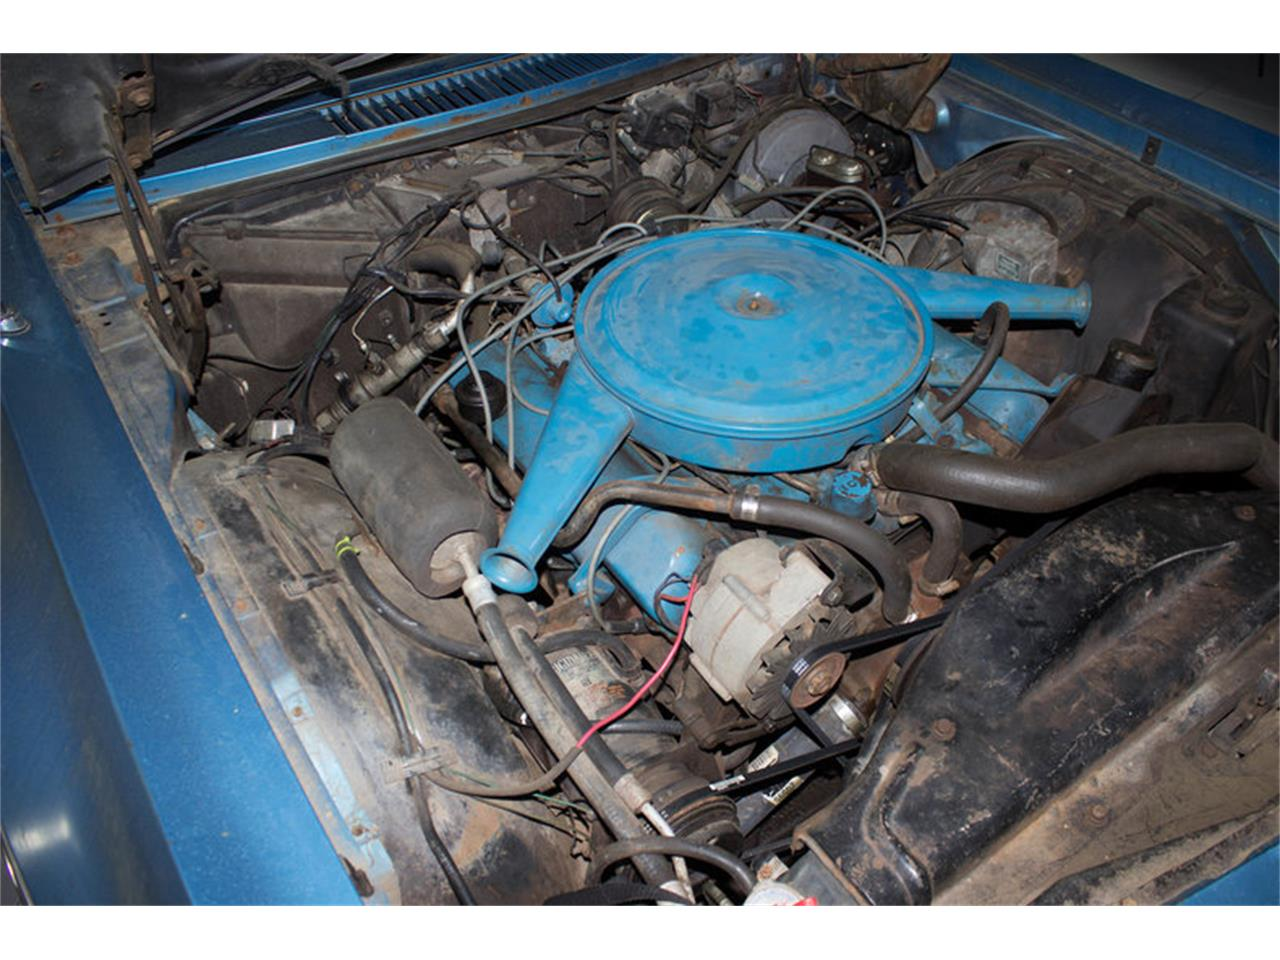 Large Picture of '67 Oldsmobile Toronado located in Palmetto Florida - $6,997.00 - MZFB